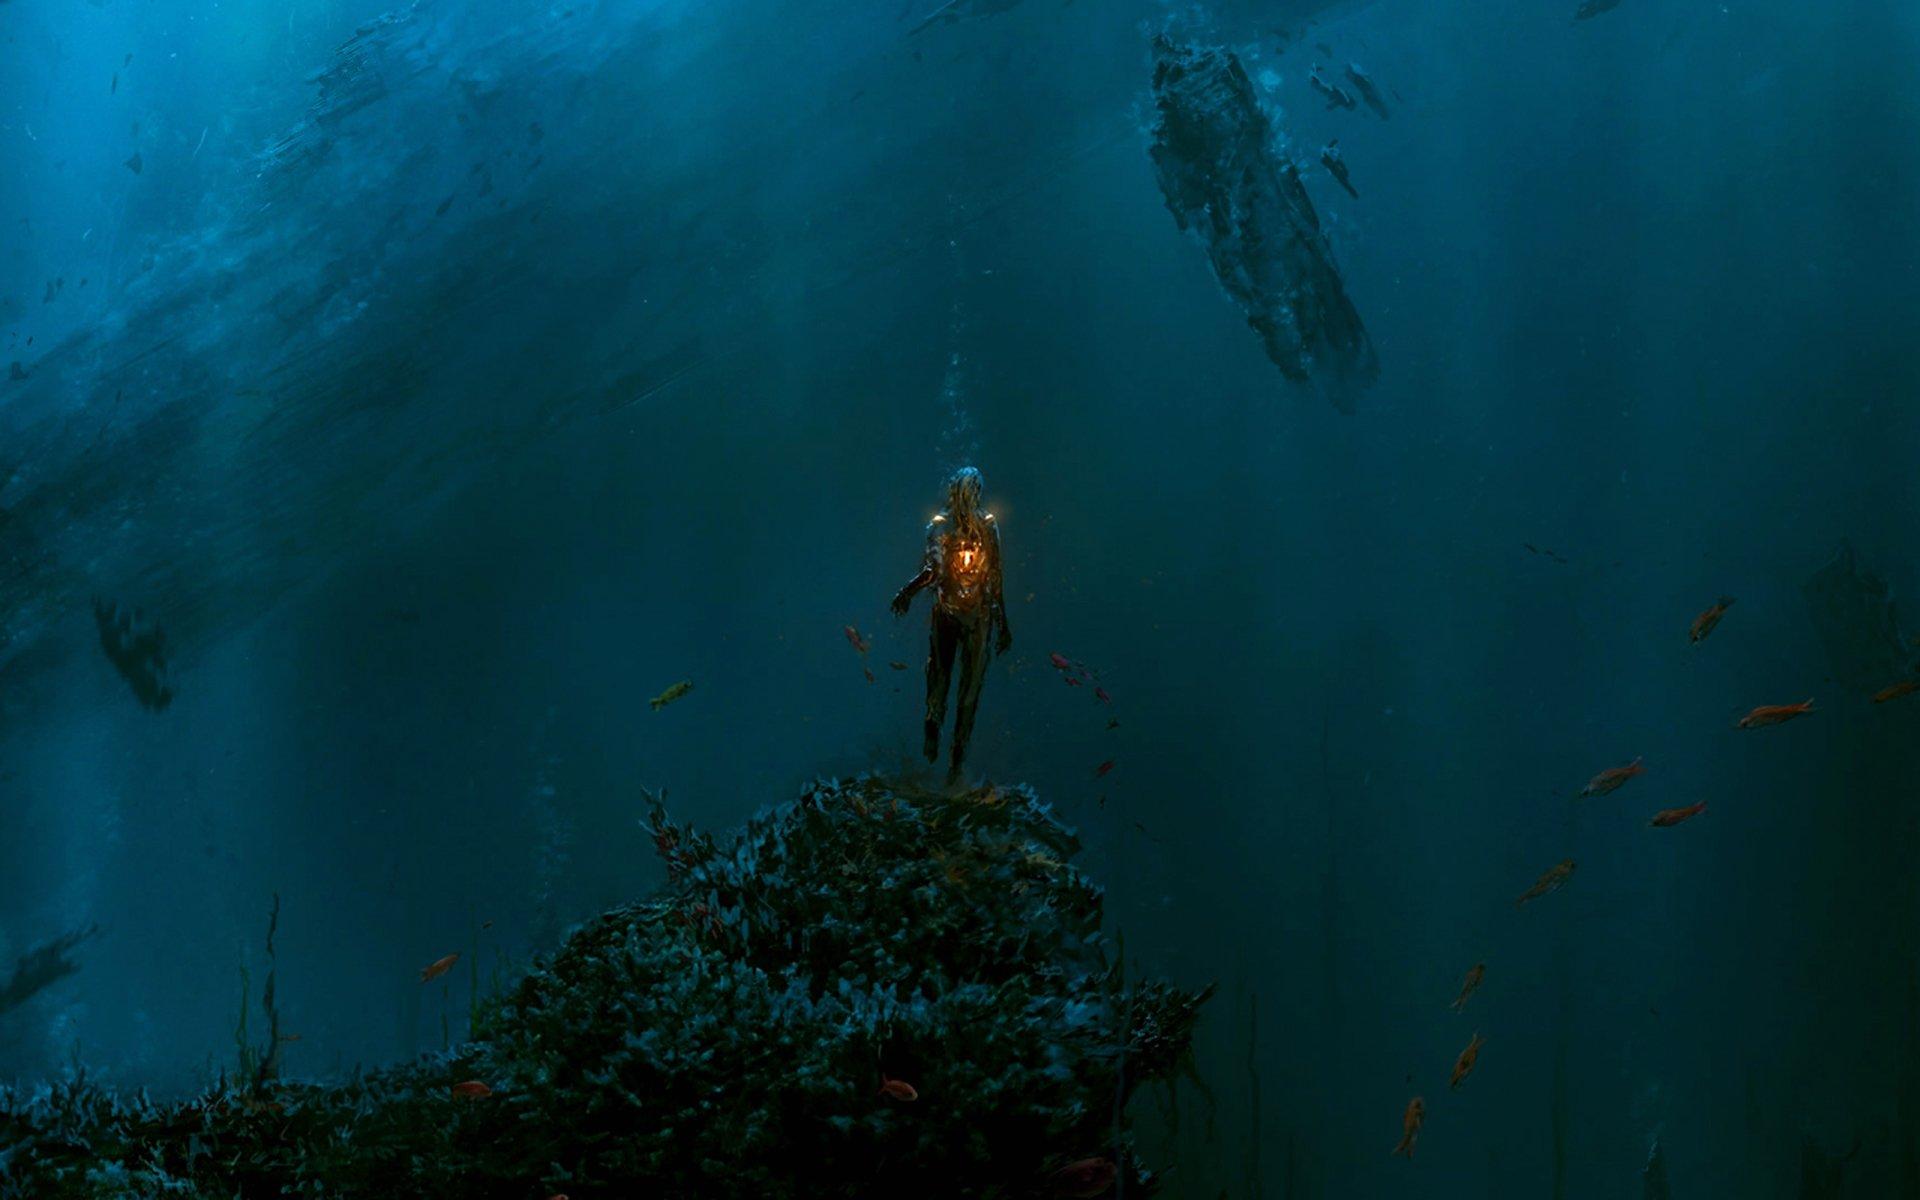 Fantaisie - Océan  Fond d'écran